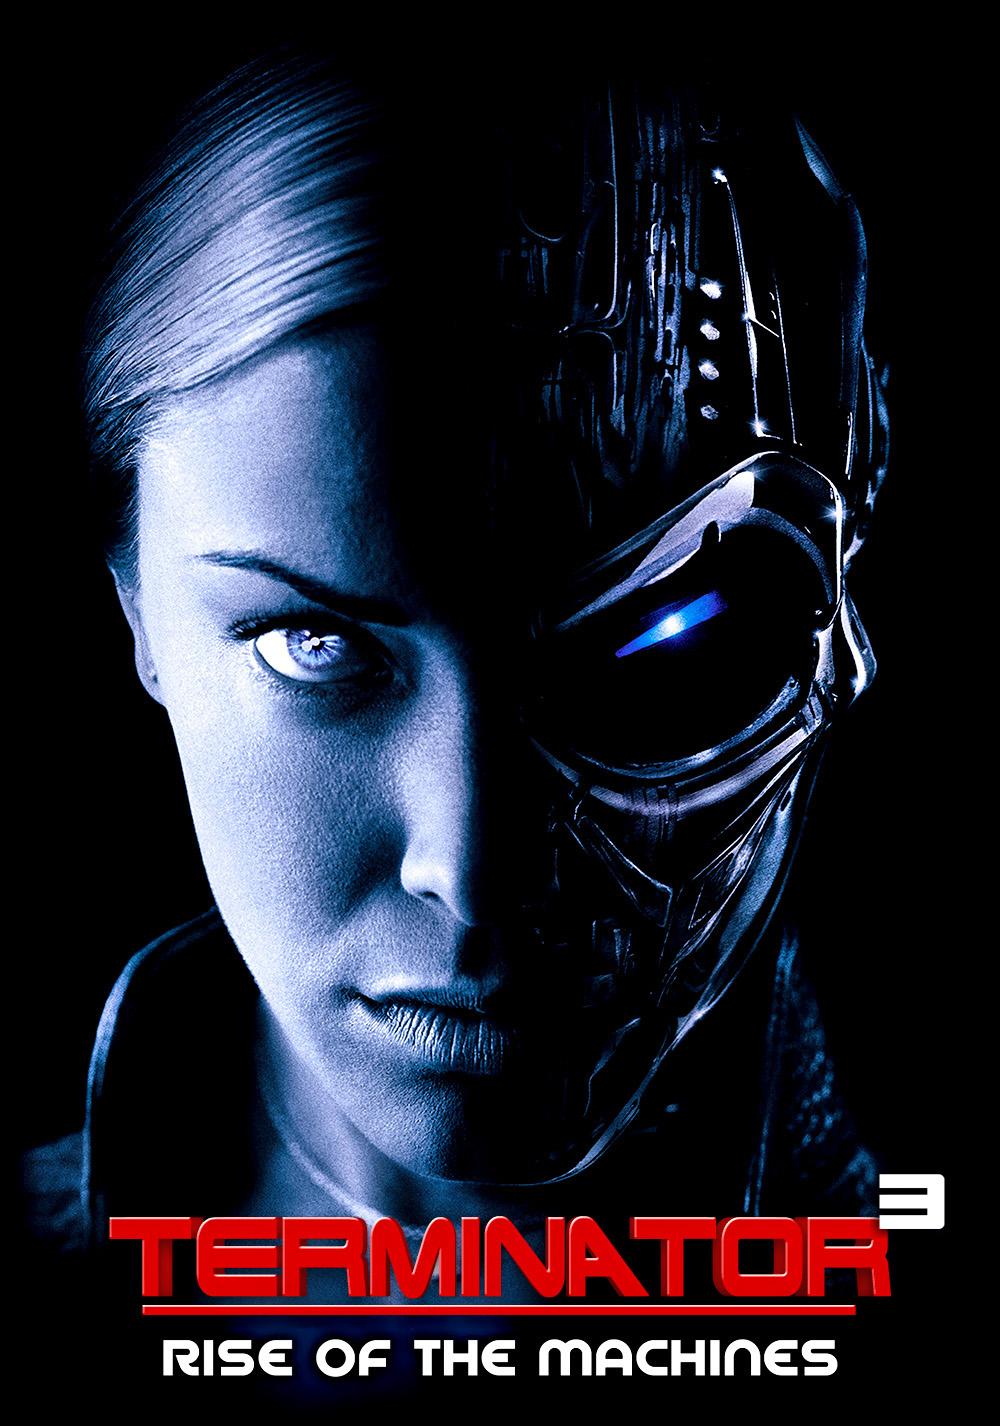 terminator 3 rise of - photo #11